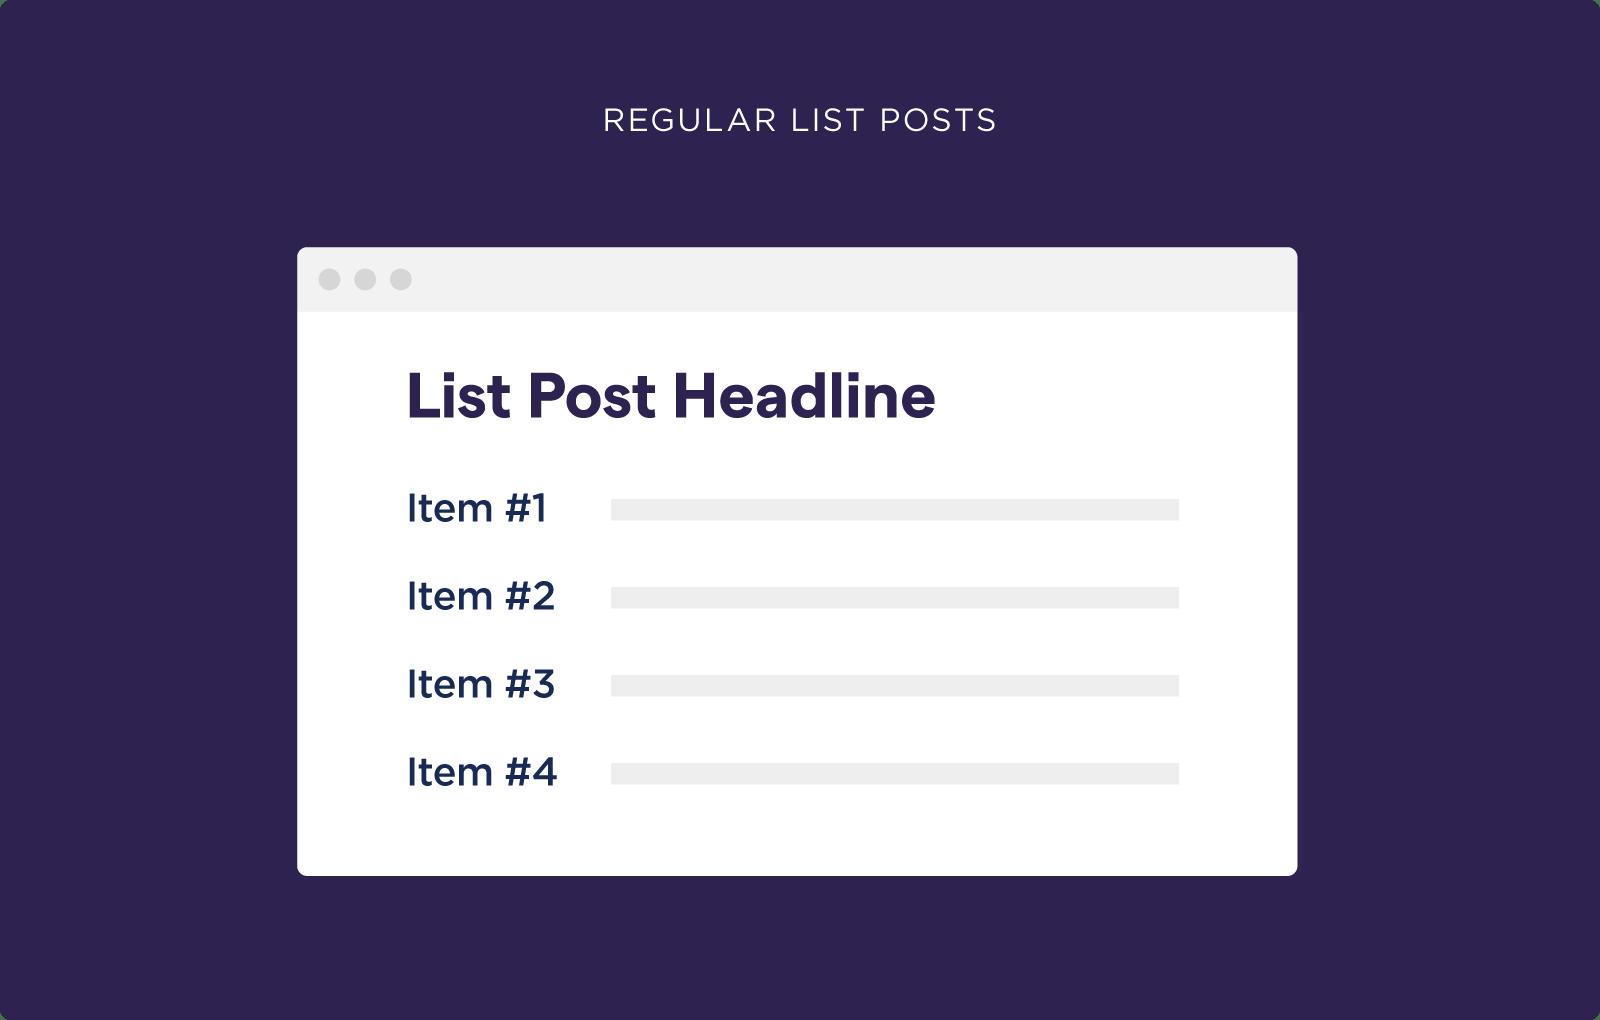 Regular list posts